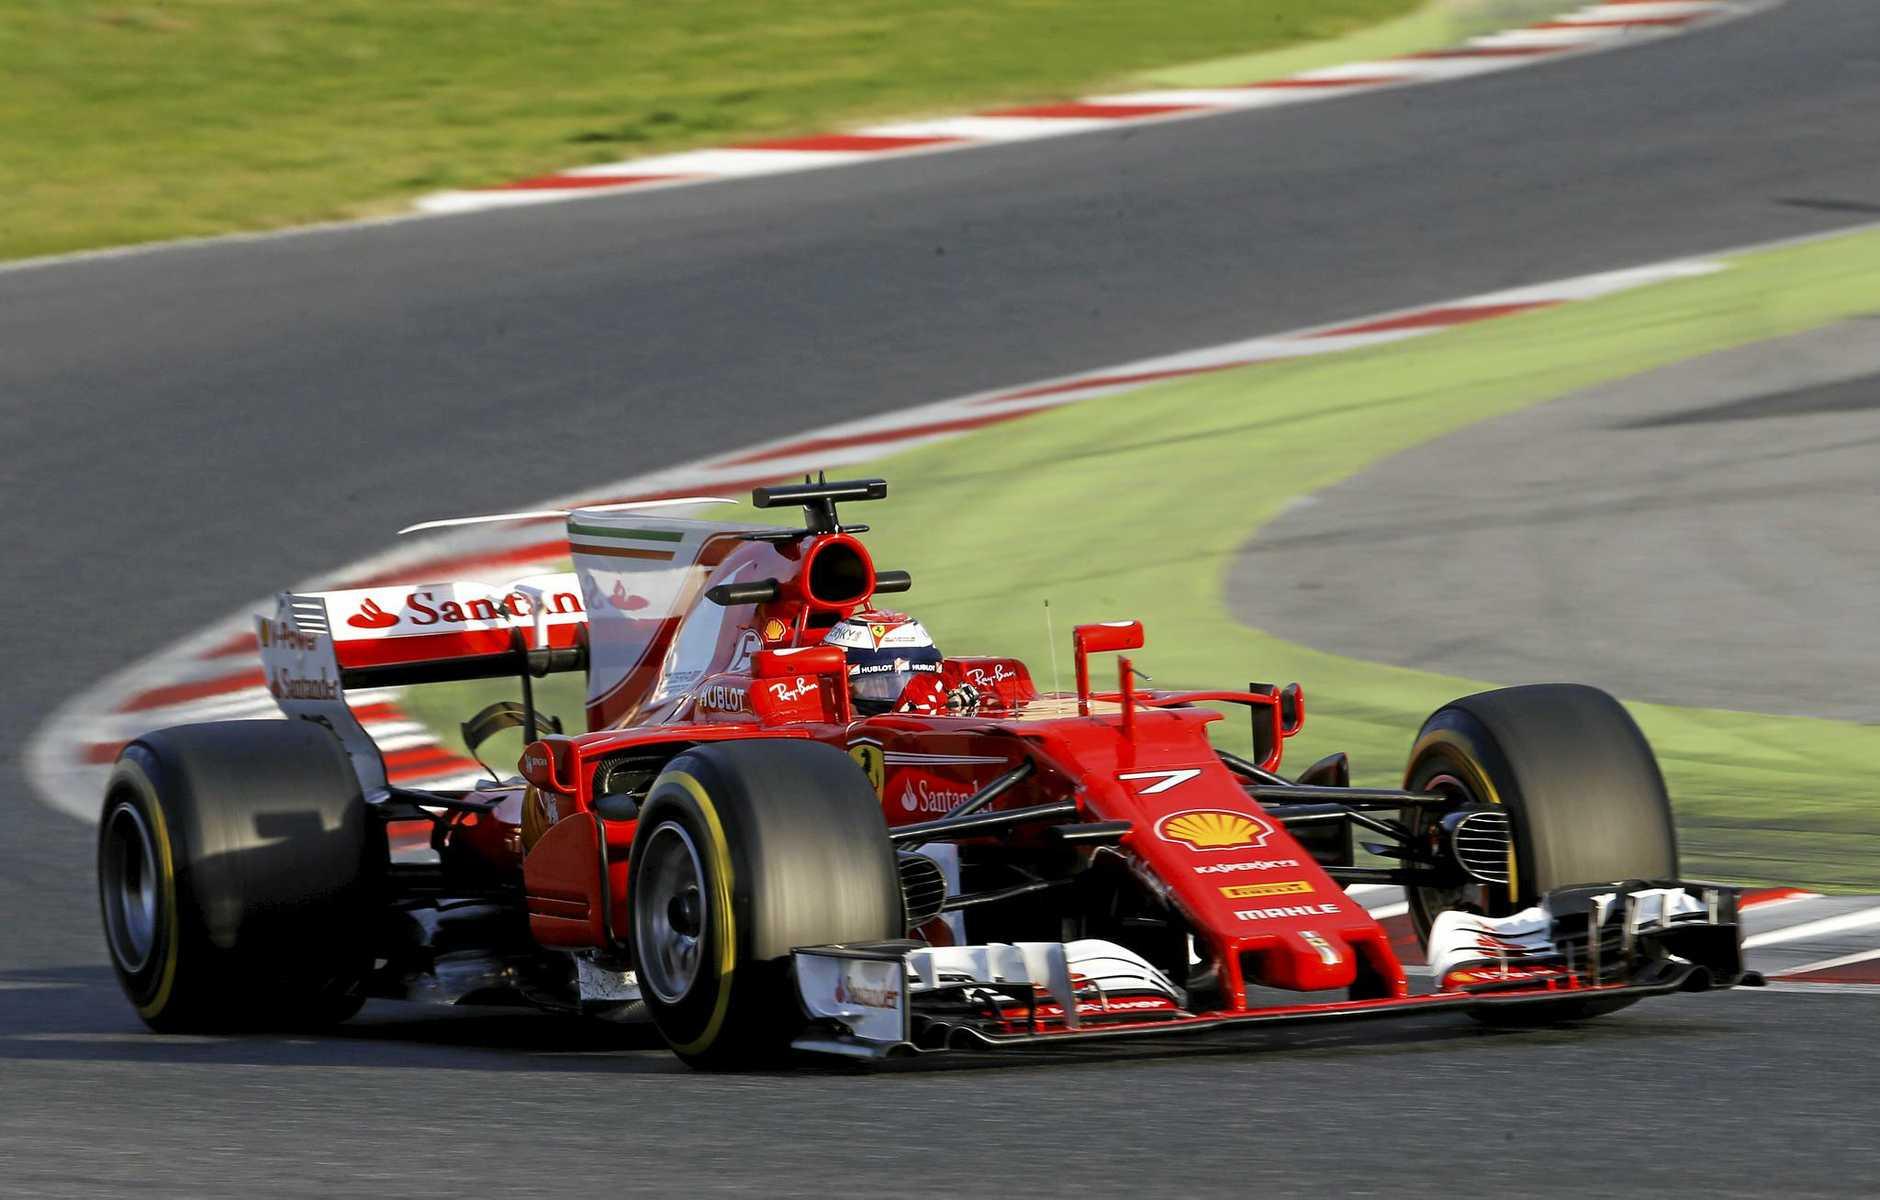 Ferrari driver Kimi Raikkonen takes a curve during a Formula One pre-season testing session at the Catalunya race track.